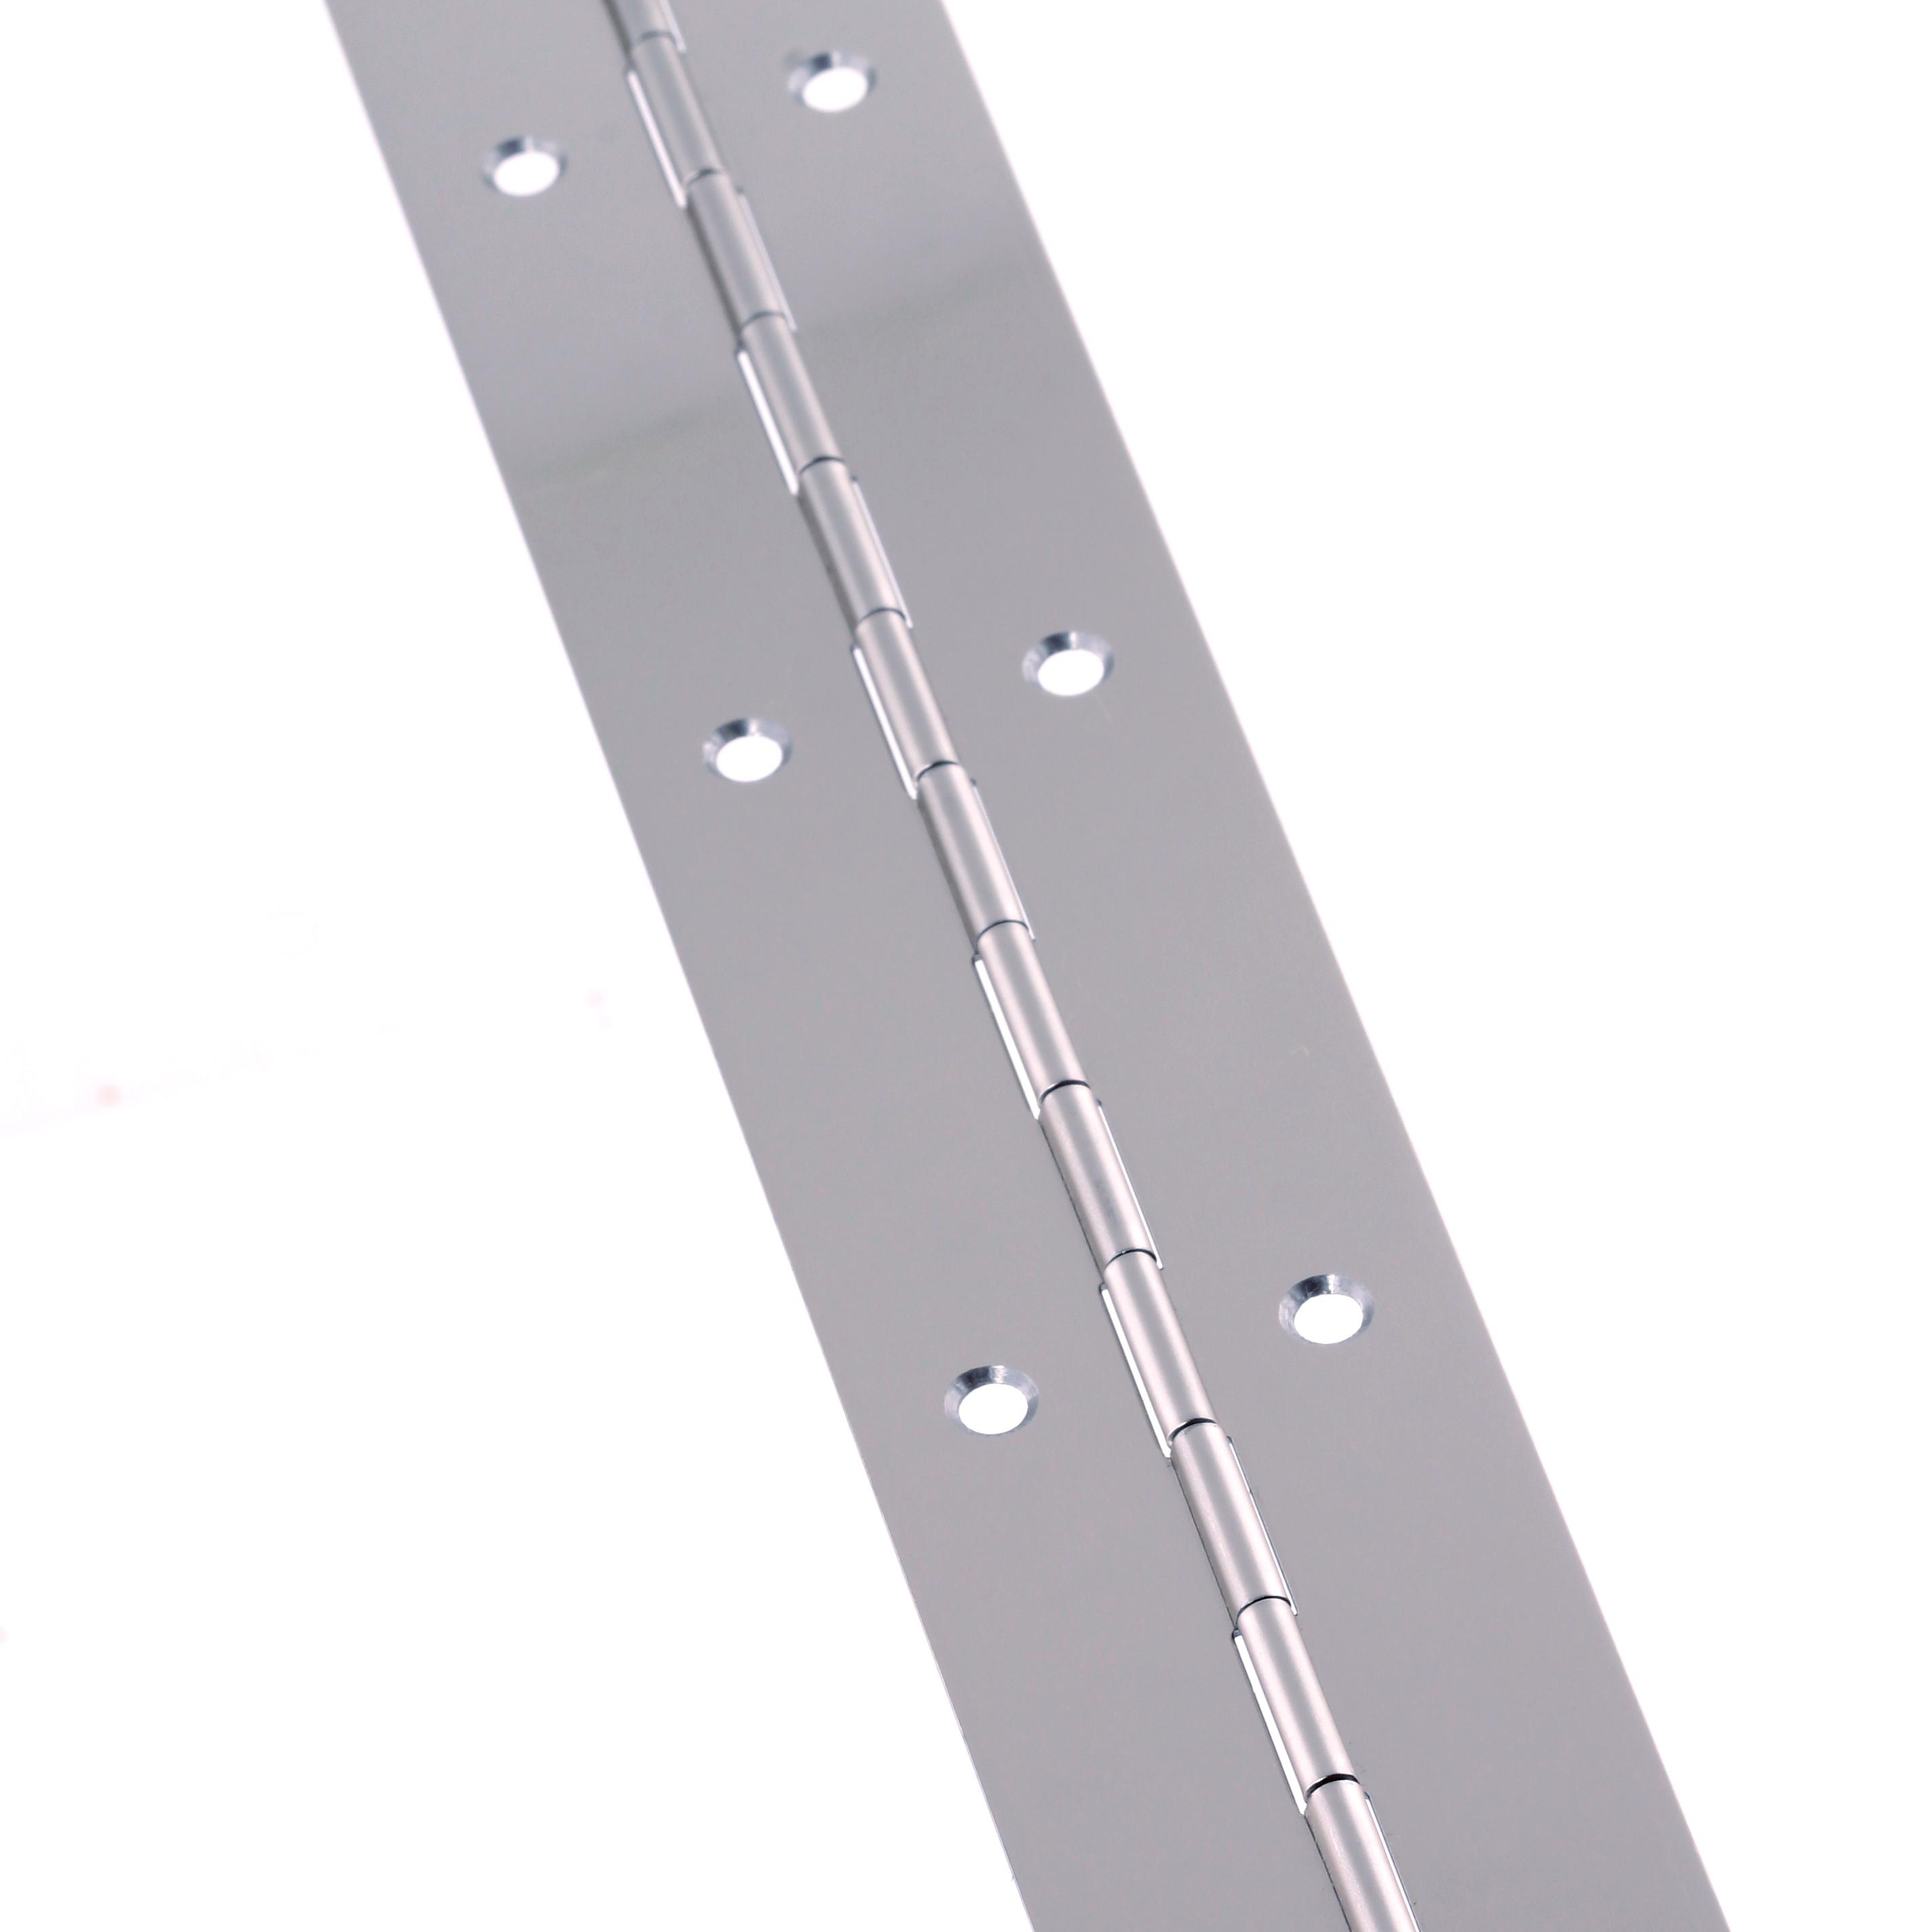 Steel Piano Hinge - 1800 x 38 x 0.7mm - Nickel Plated)